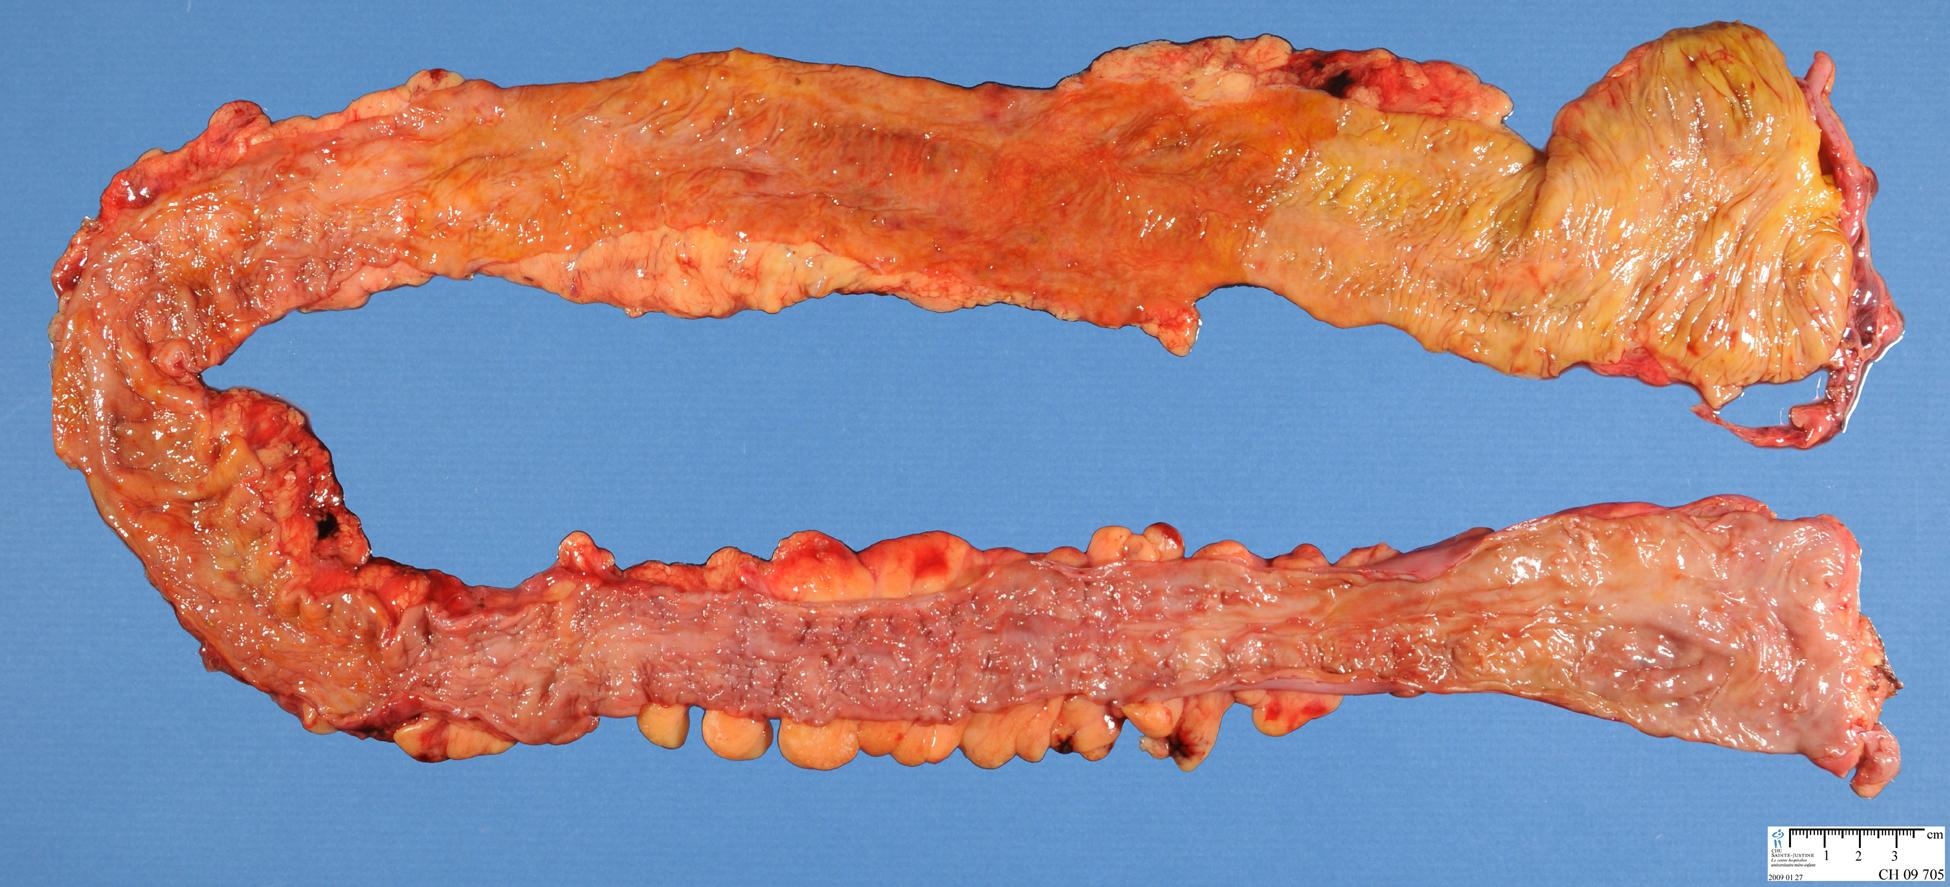 Ileitis: When It Is Not Crohn's Disease - PubMed Central (PMC)